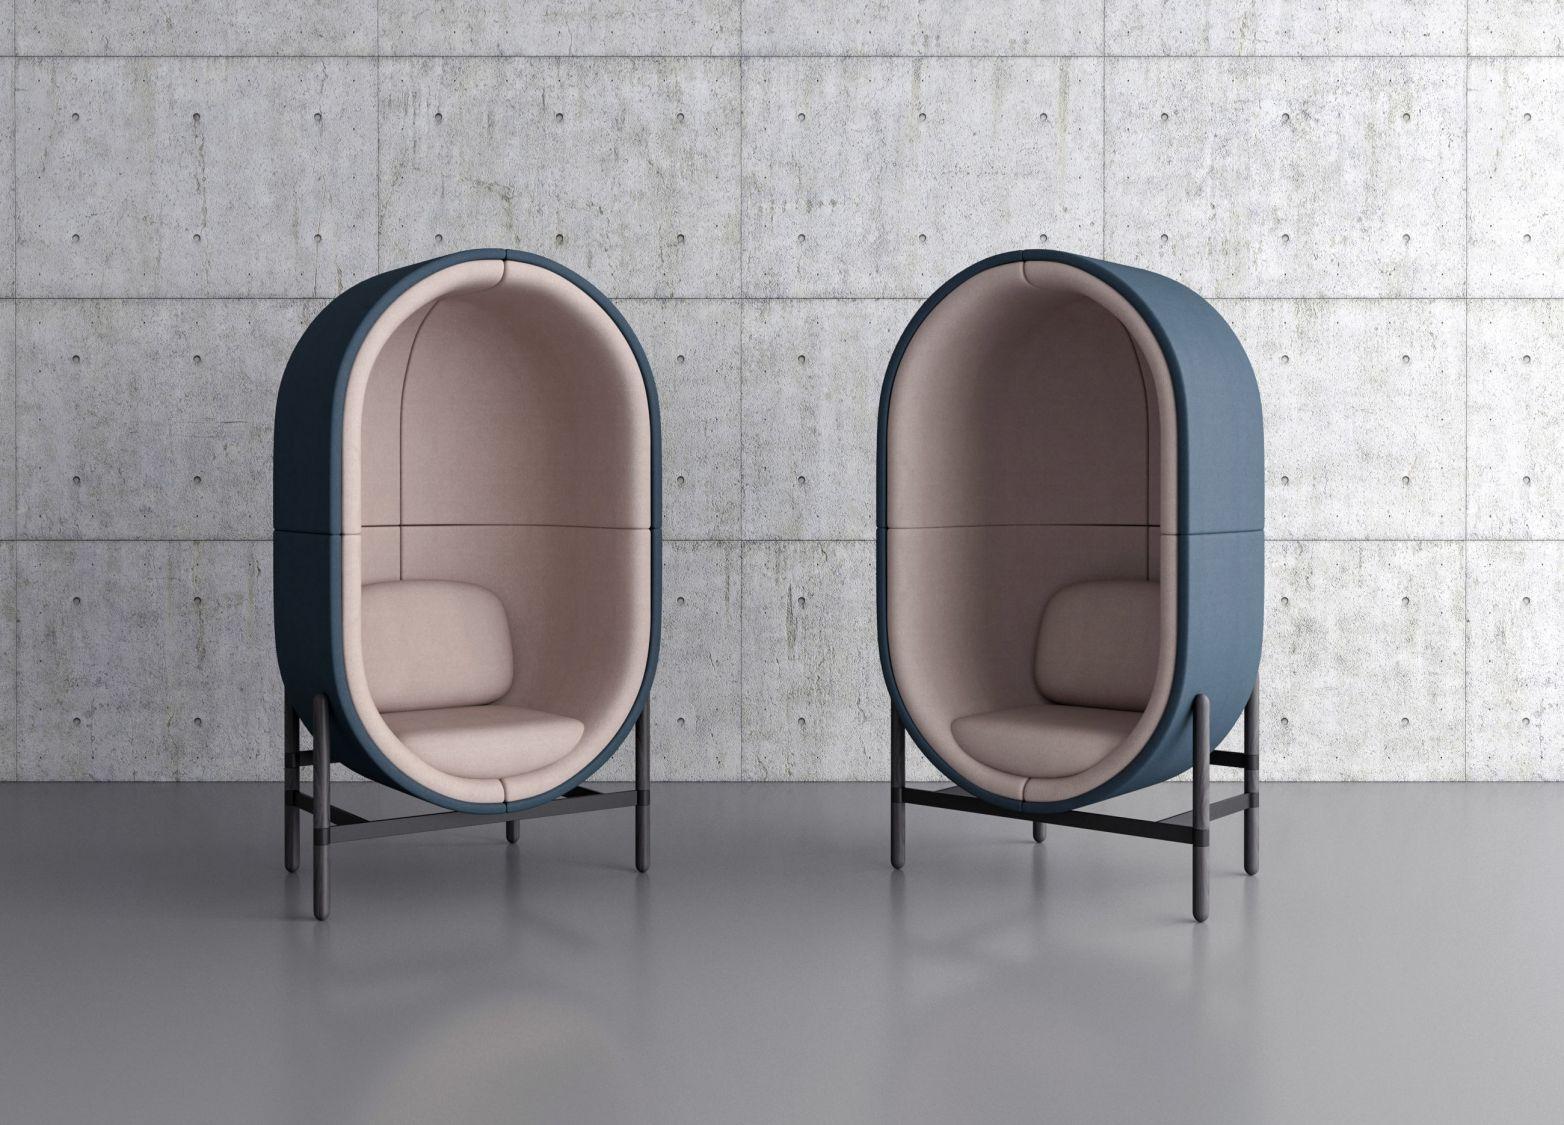 capsule-palau-seat-visual atelier 8-product design-1.jpg